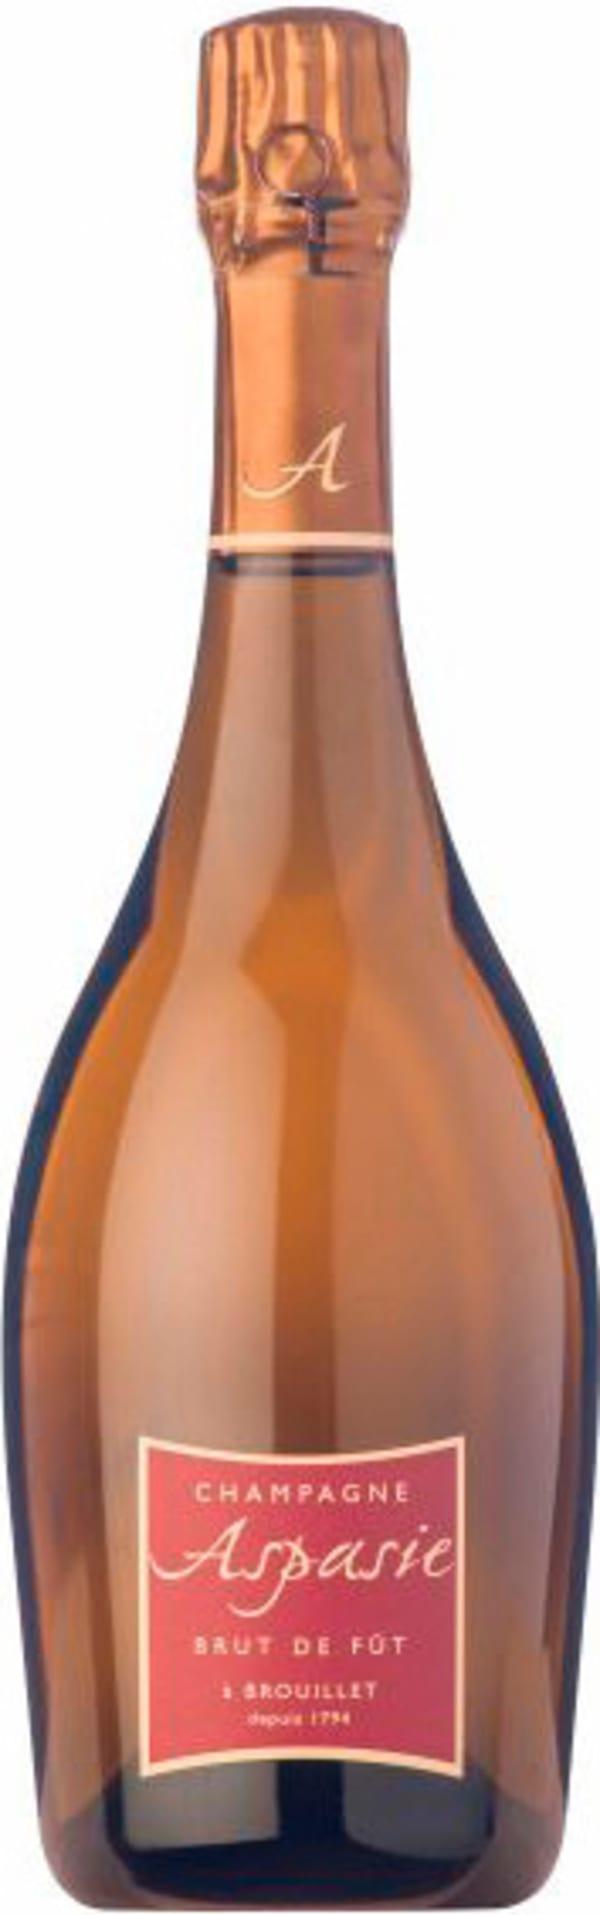 Aspasie Brut de Fût Champagne